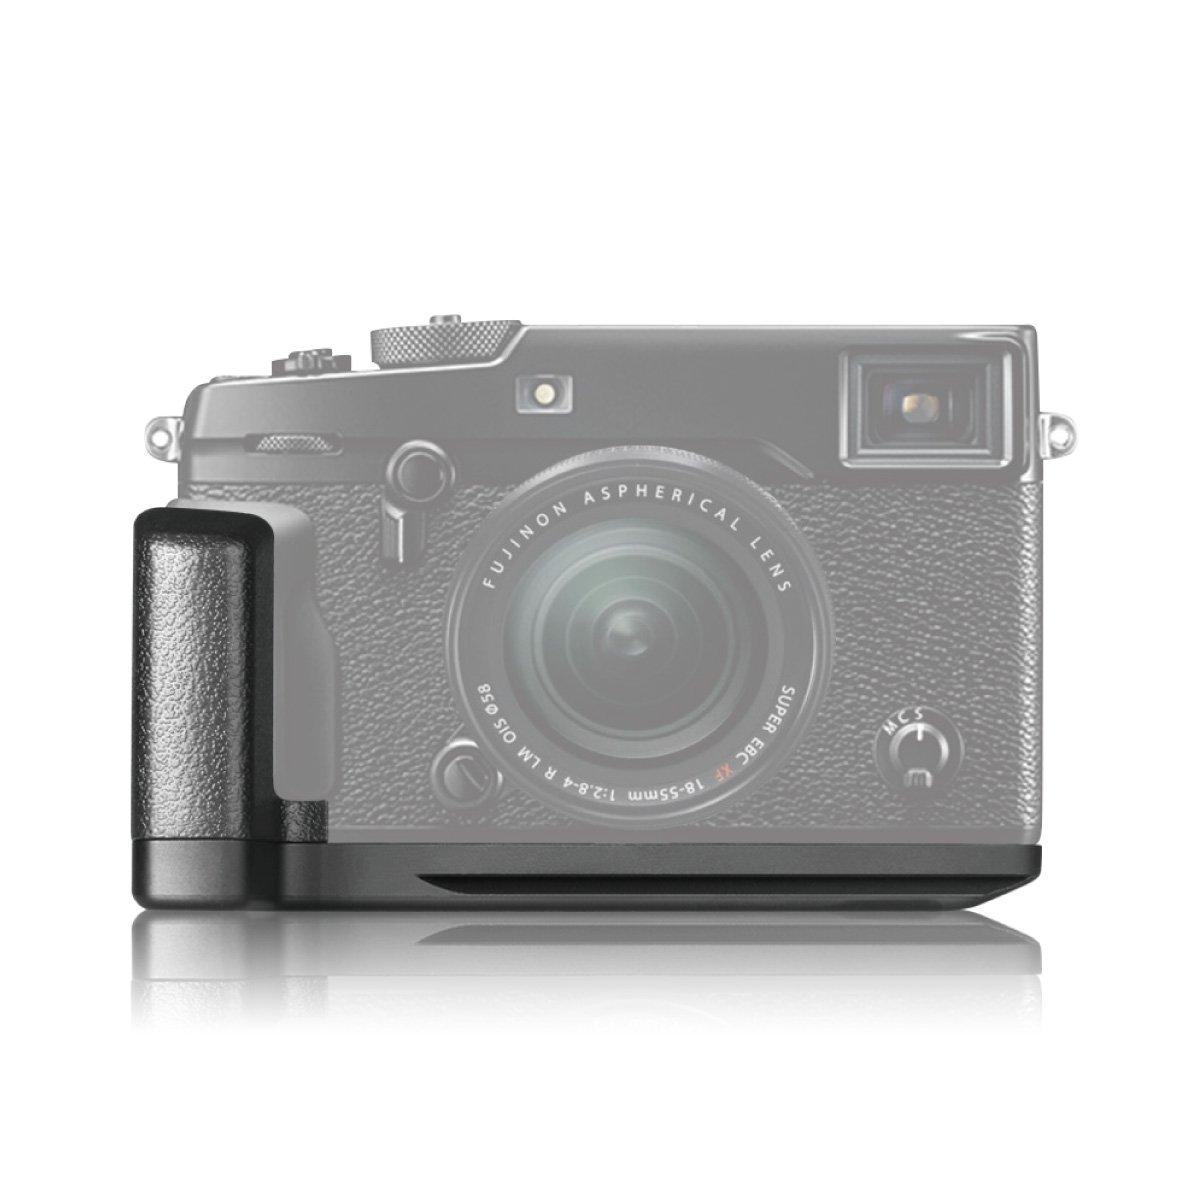 Meike MK-XPro2G Handle Metal Hand Grip MHG-XPRO2 Replacement for Fujifilm X-Pro2 Digital Mirrorless Camera by MEKE